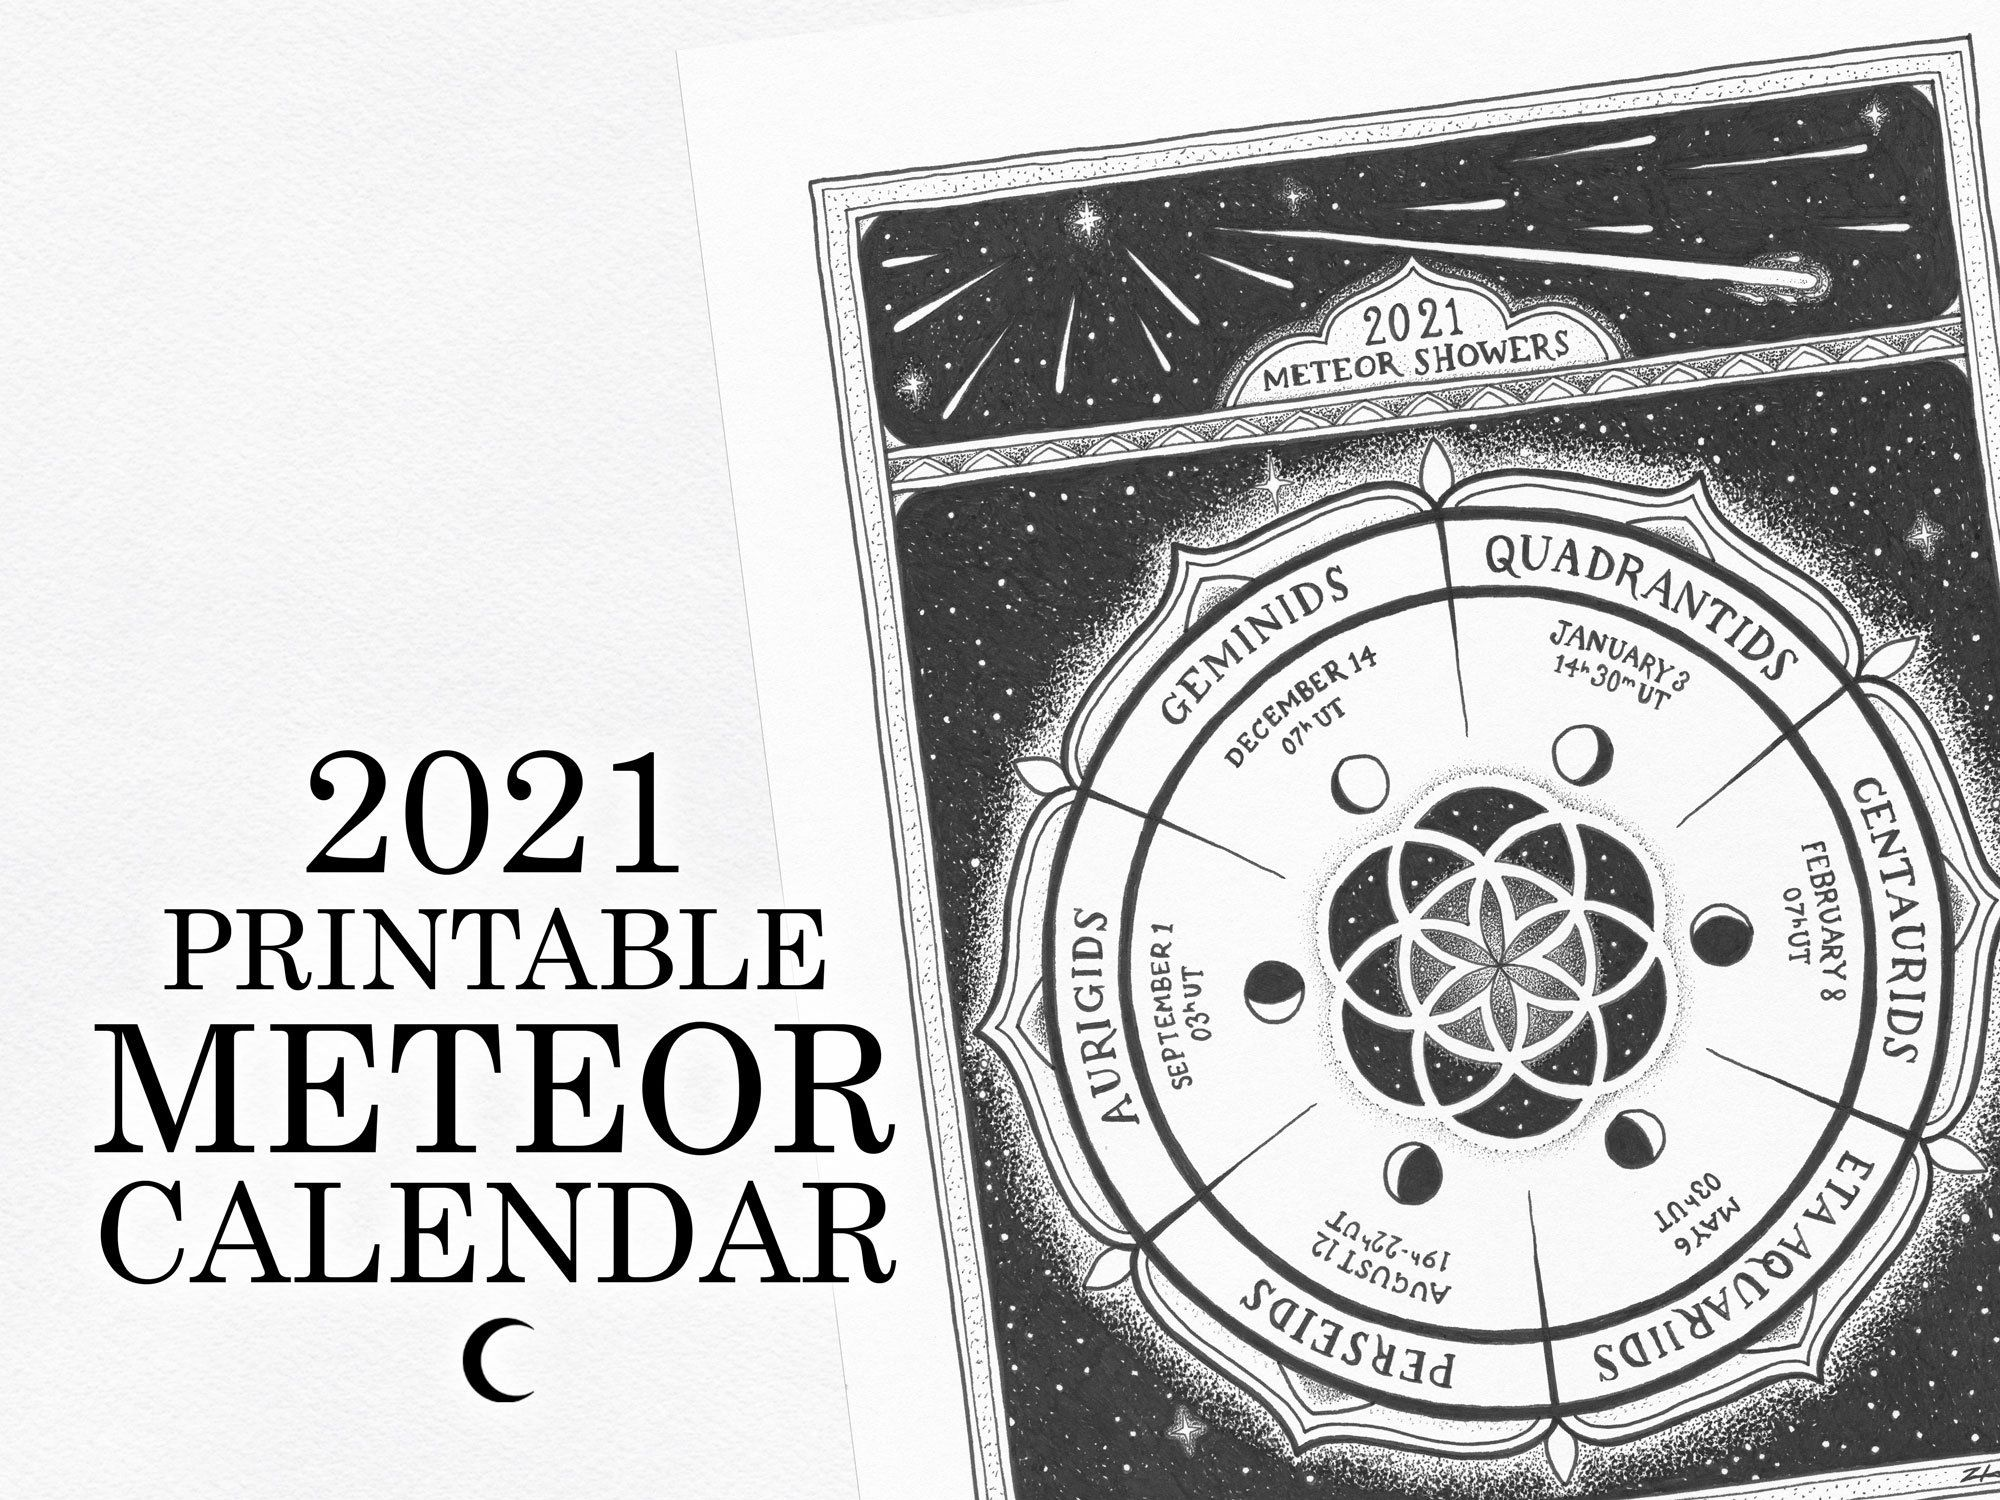 Meteor Shower Calendar 2021 2021 Printable Meteor Showers Calendar   Etsy   Meteor shower